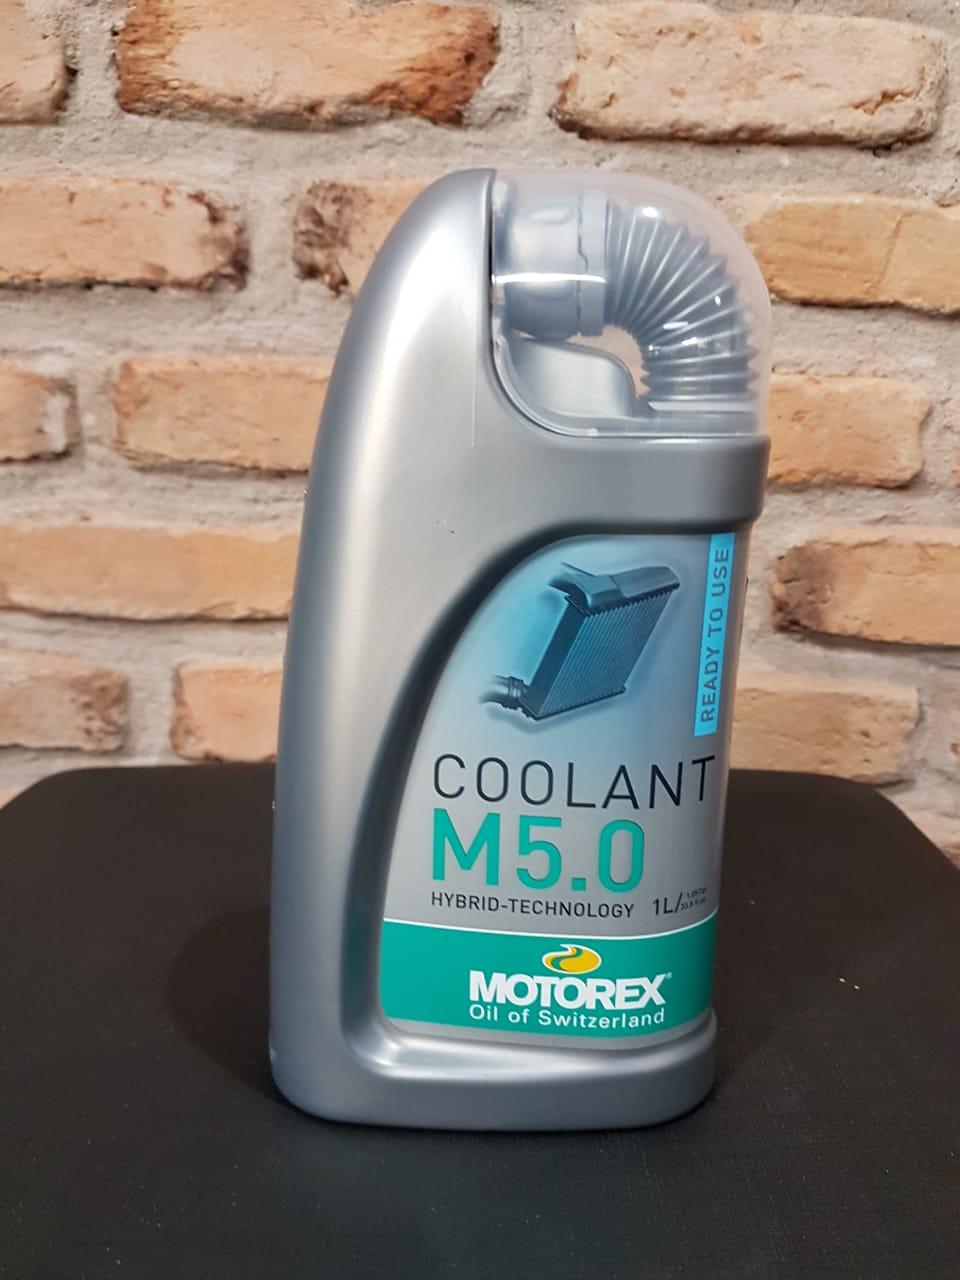 Coolant M5.0 - 1L - Motorex